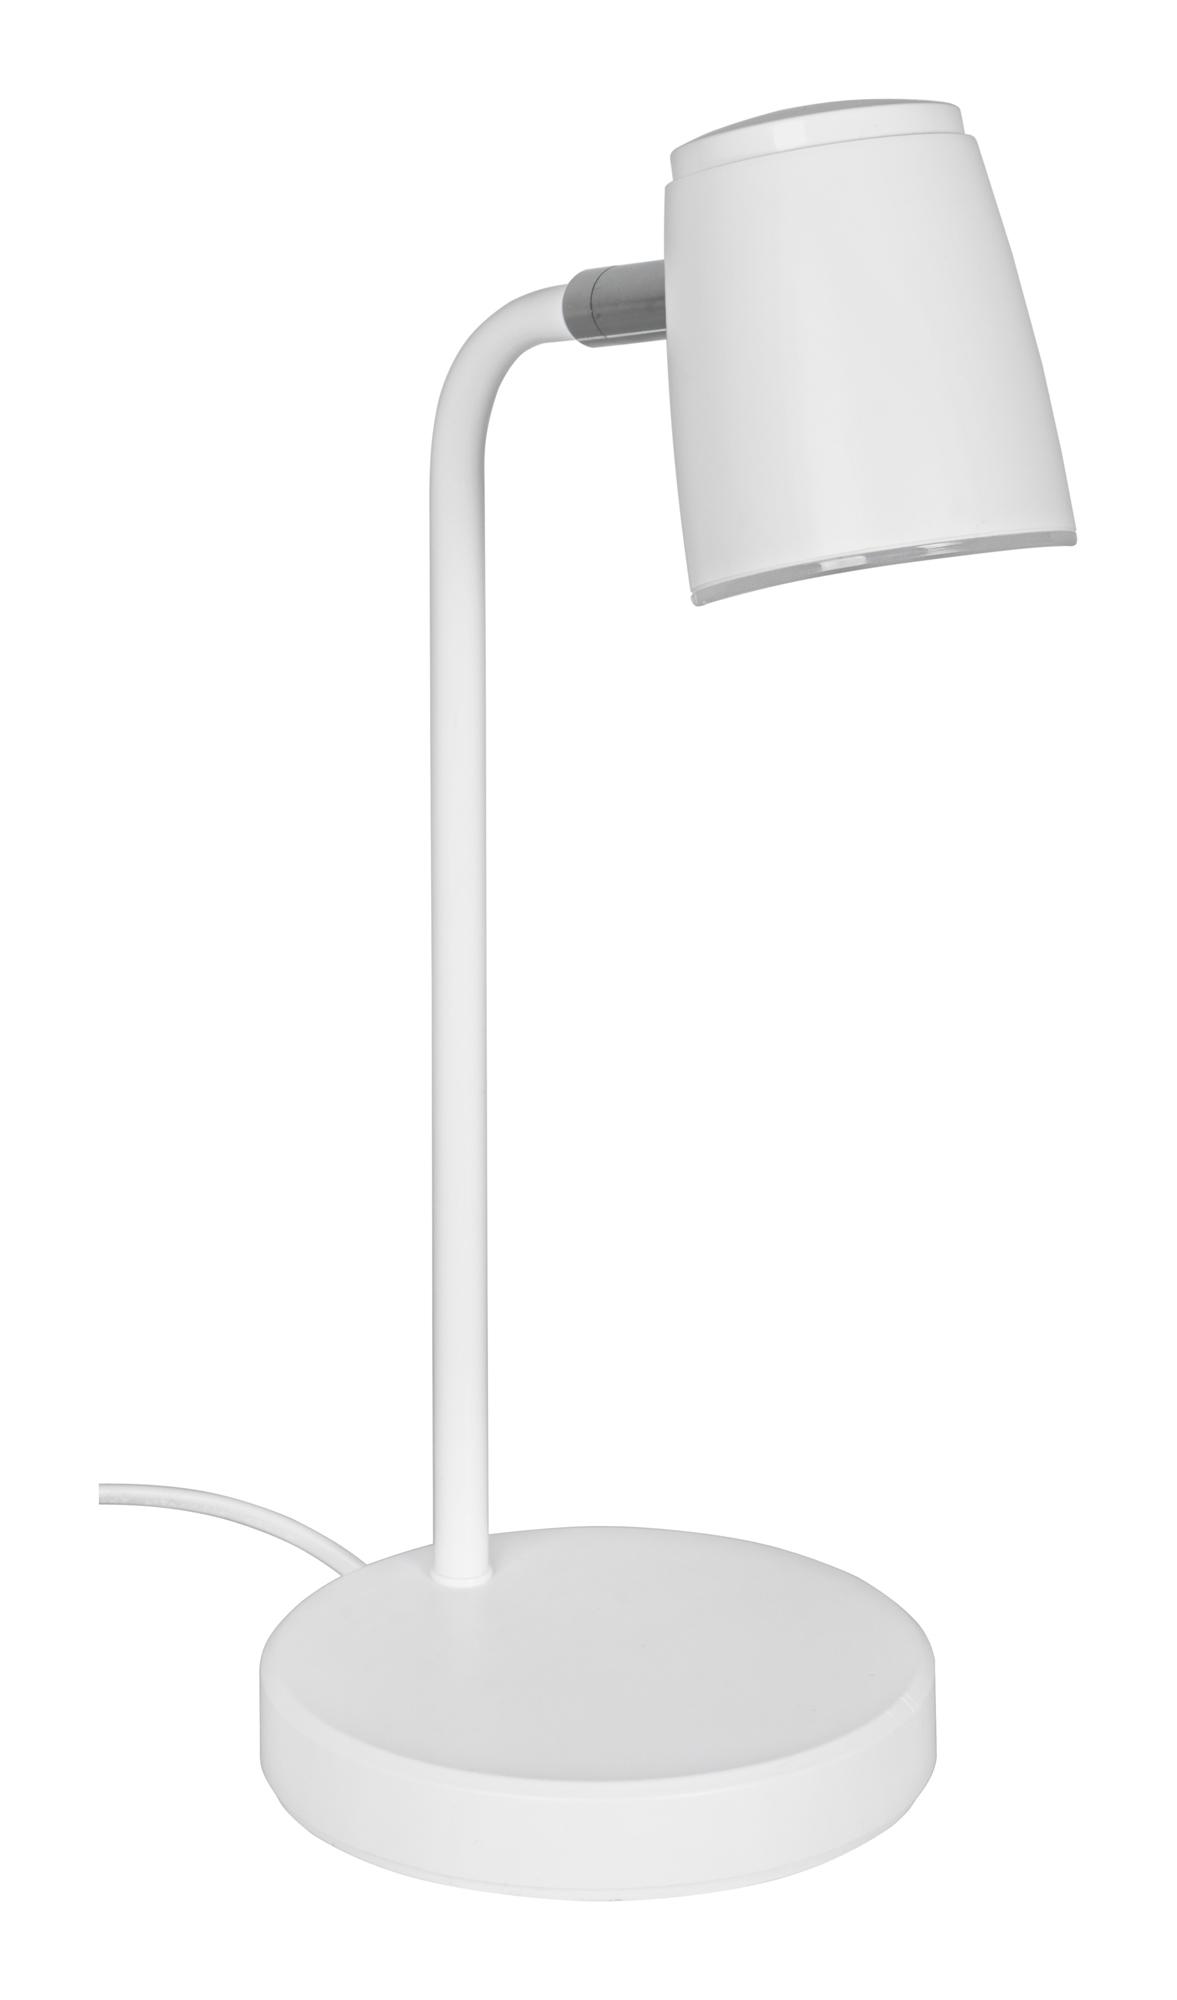 Lampka biurkowa LED Activejet biała AJE-NERO White